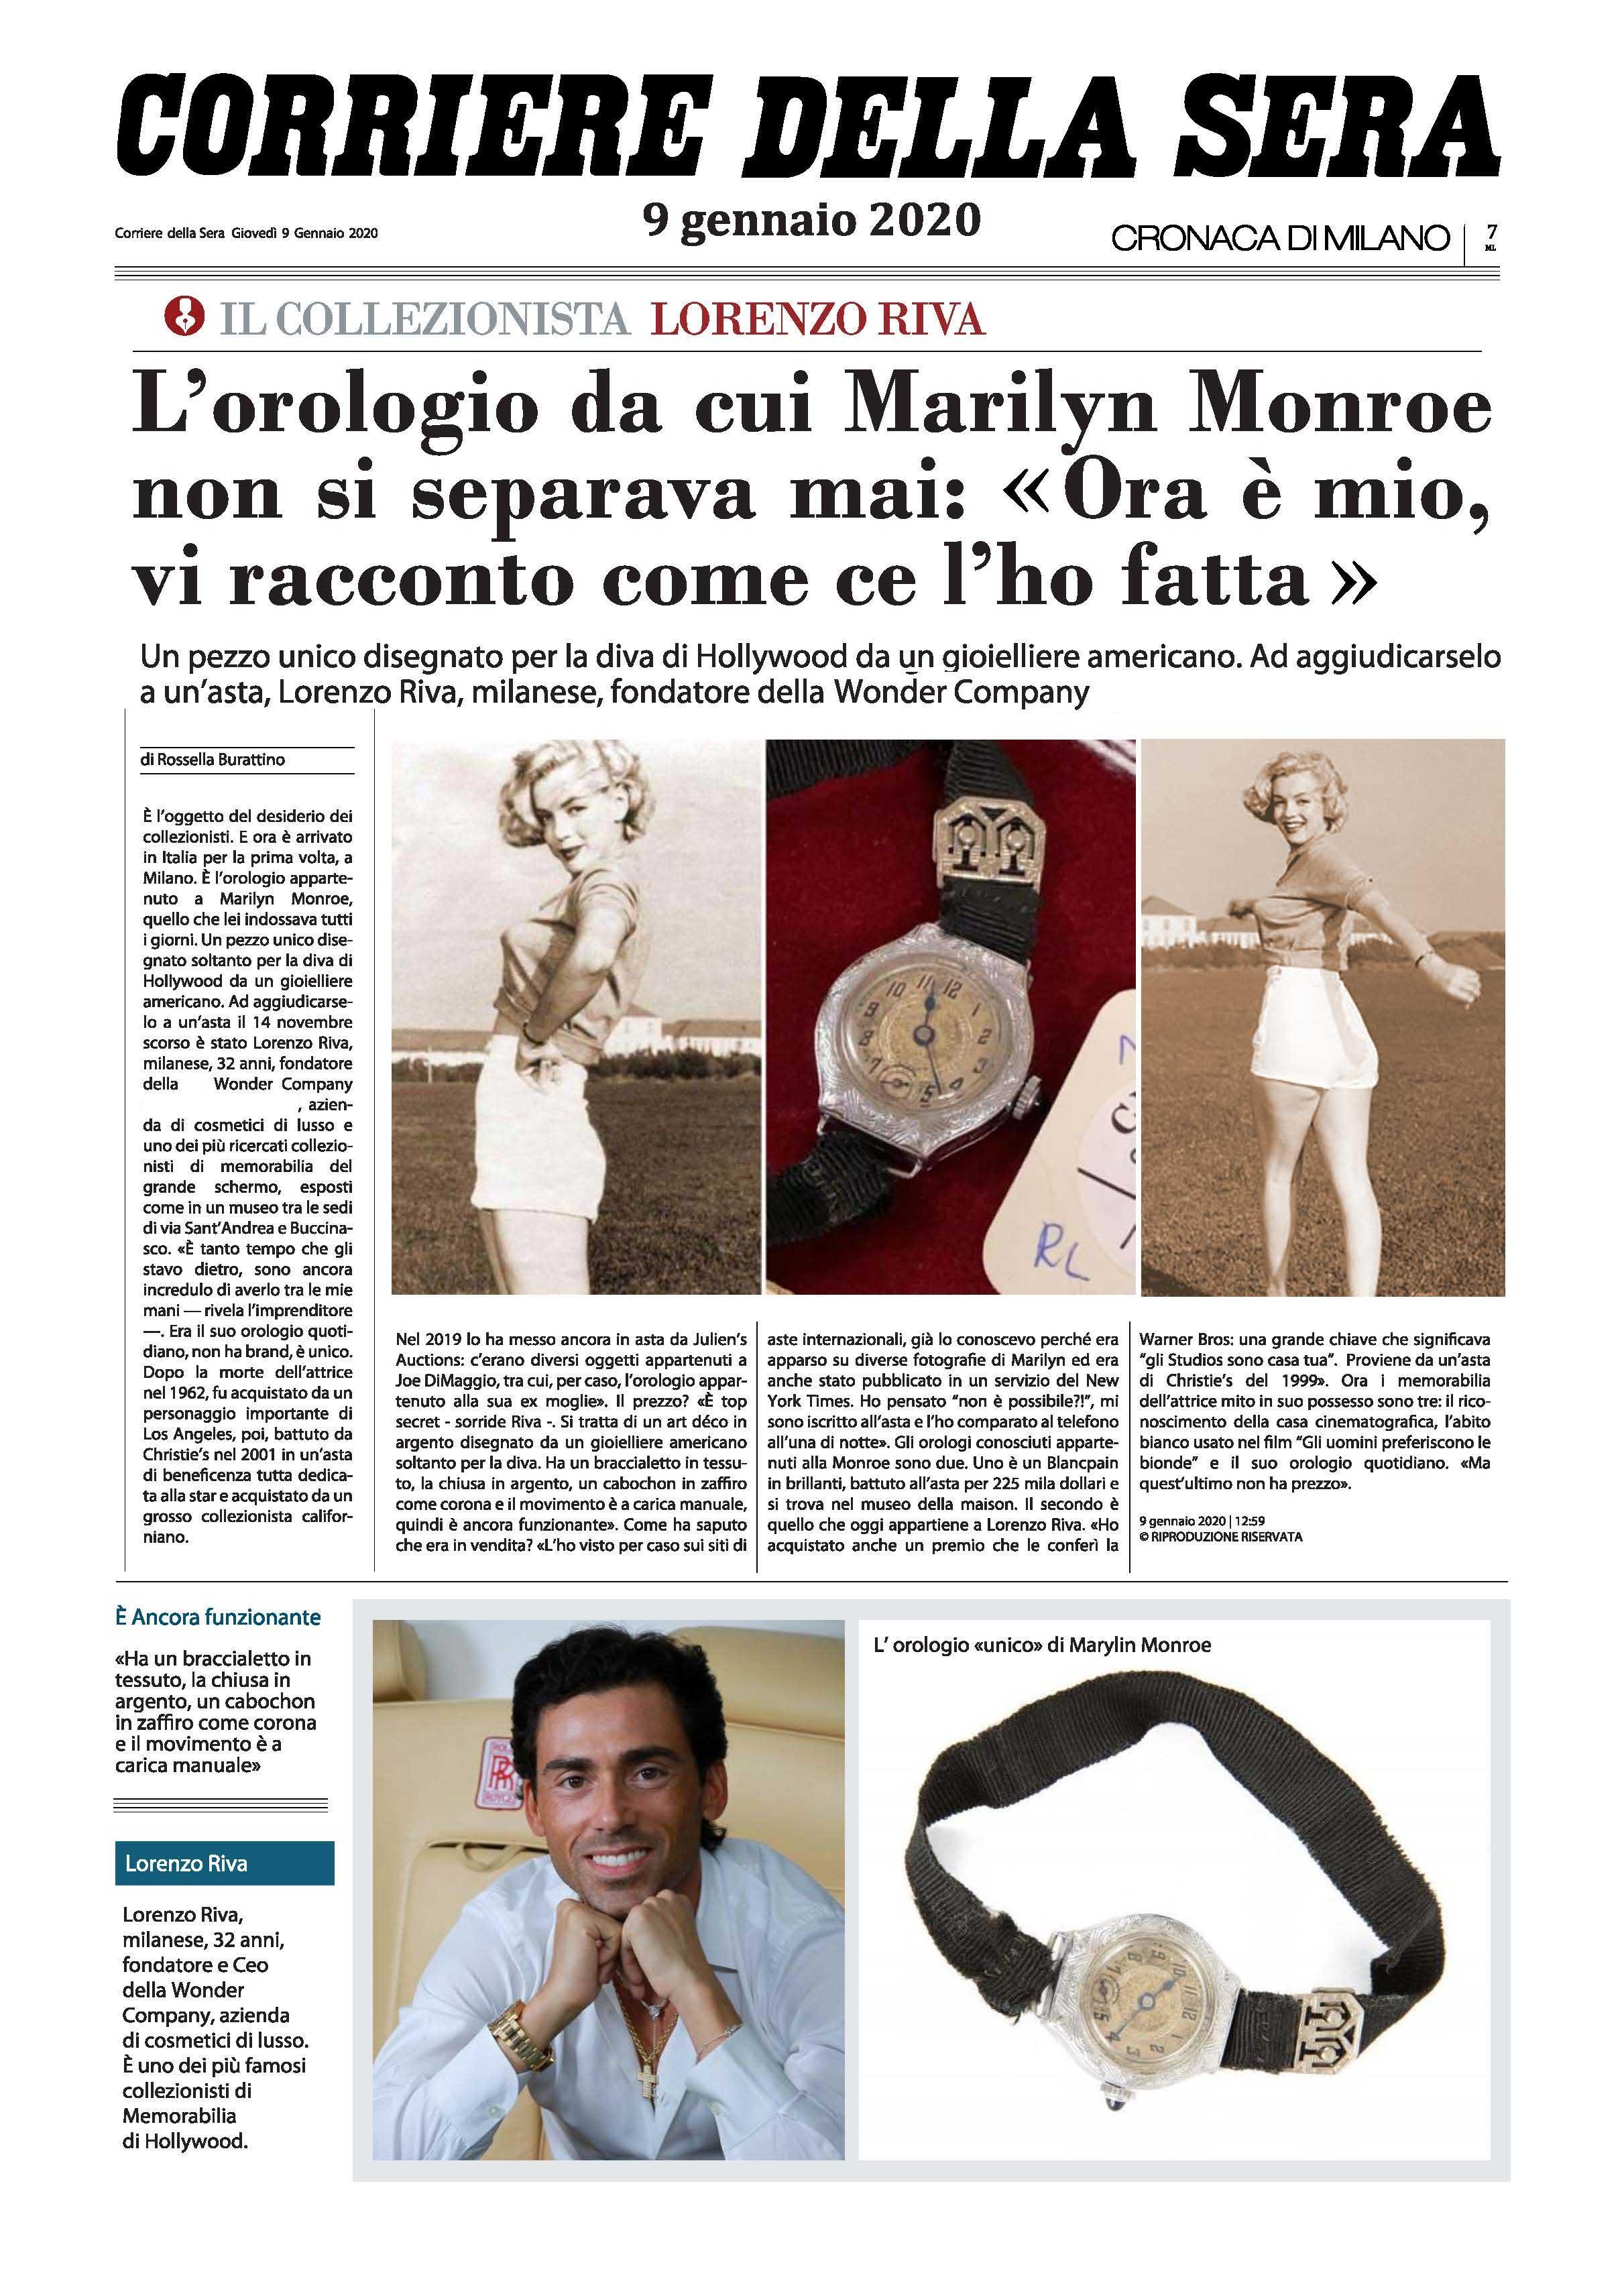 Lorenzo Riva LR Wonder collezionista orologio Marilyn Monroe